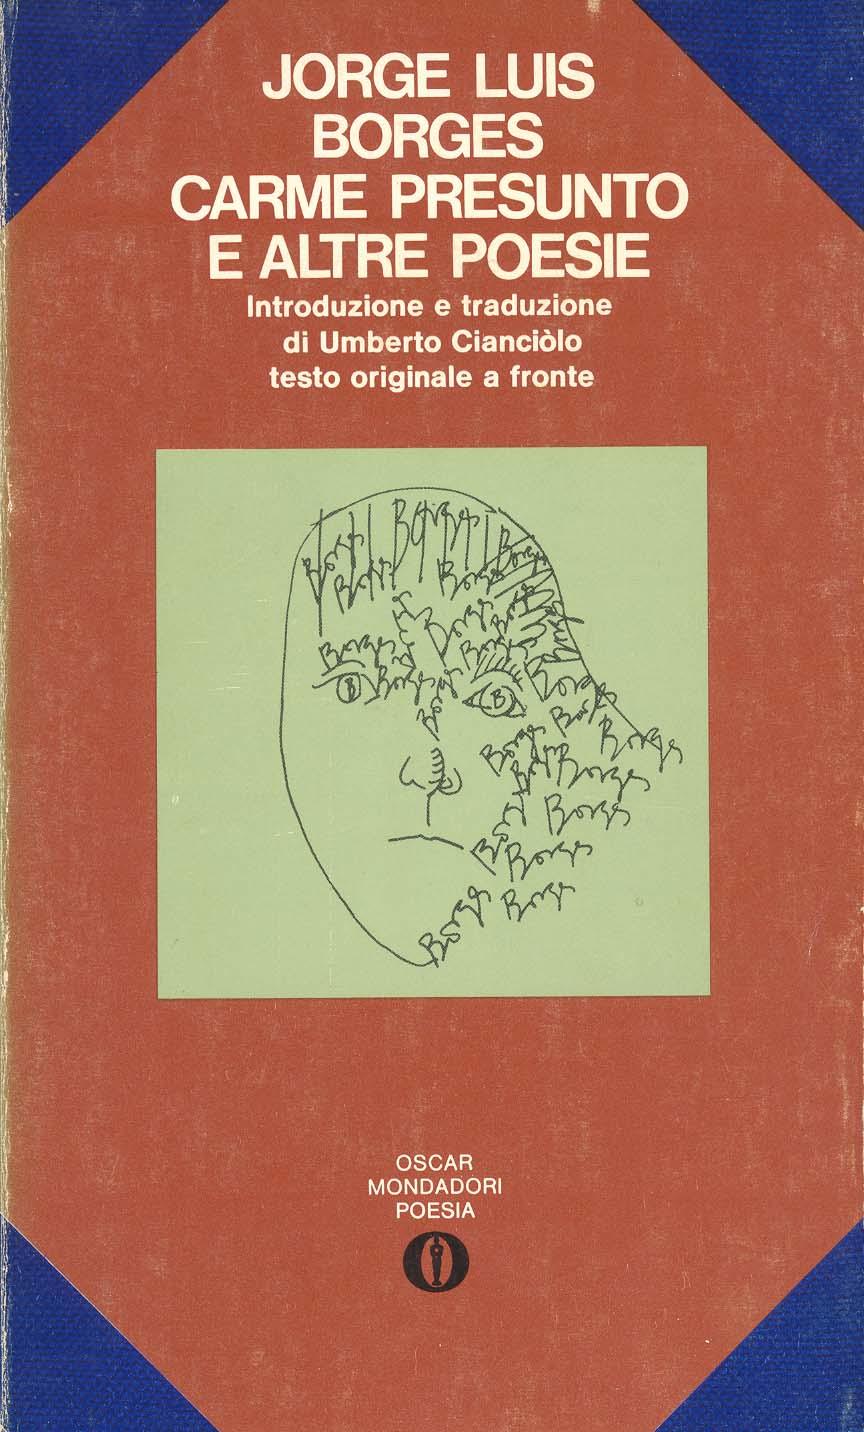 Carme presunto e altre poesie